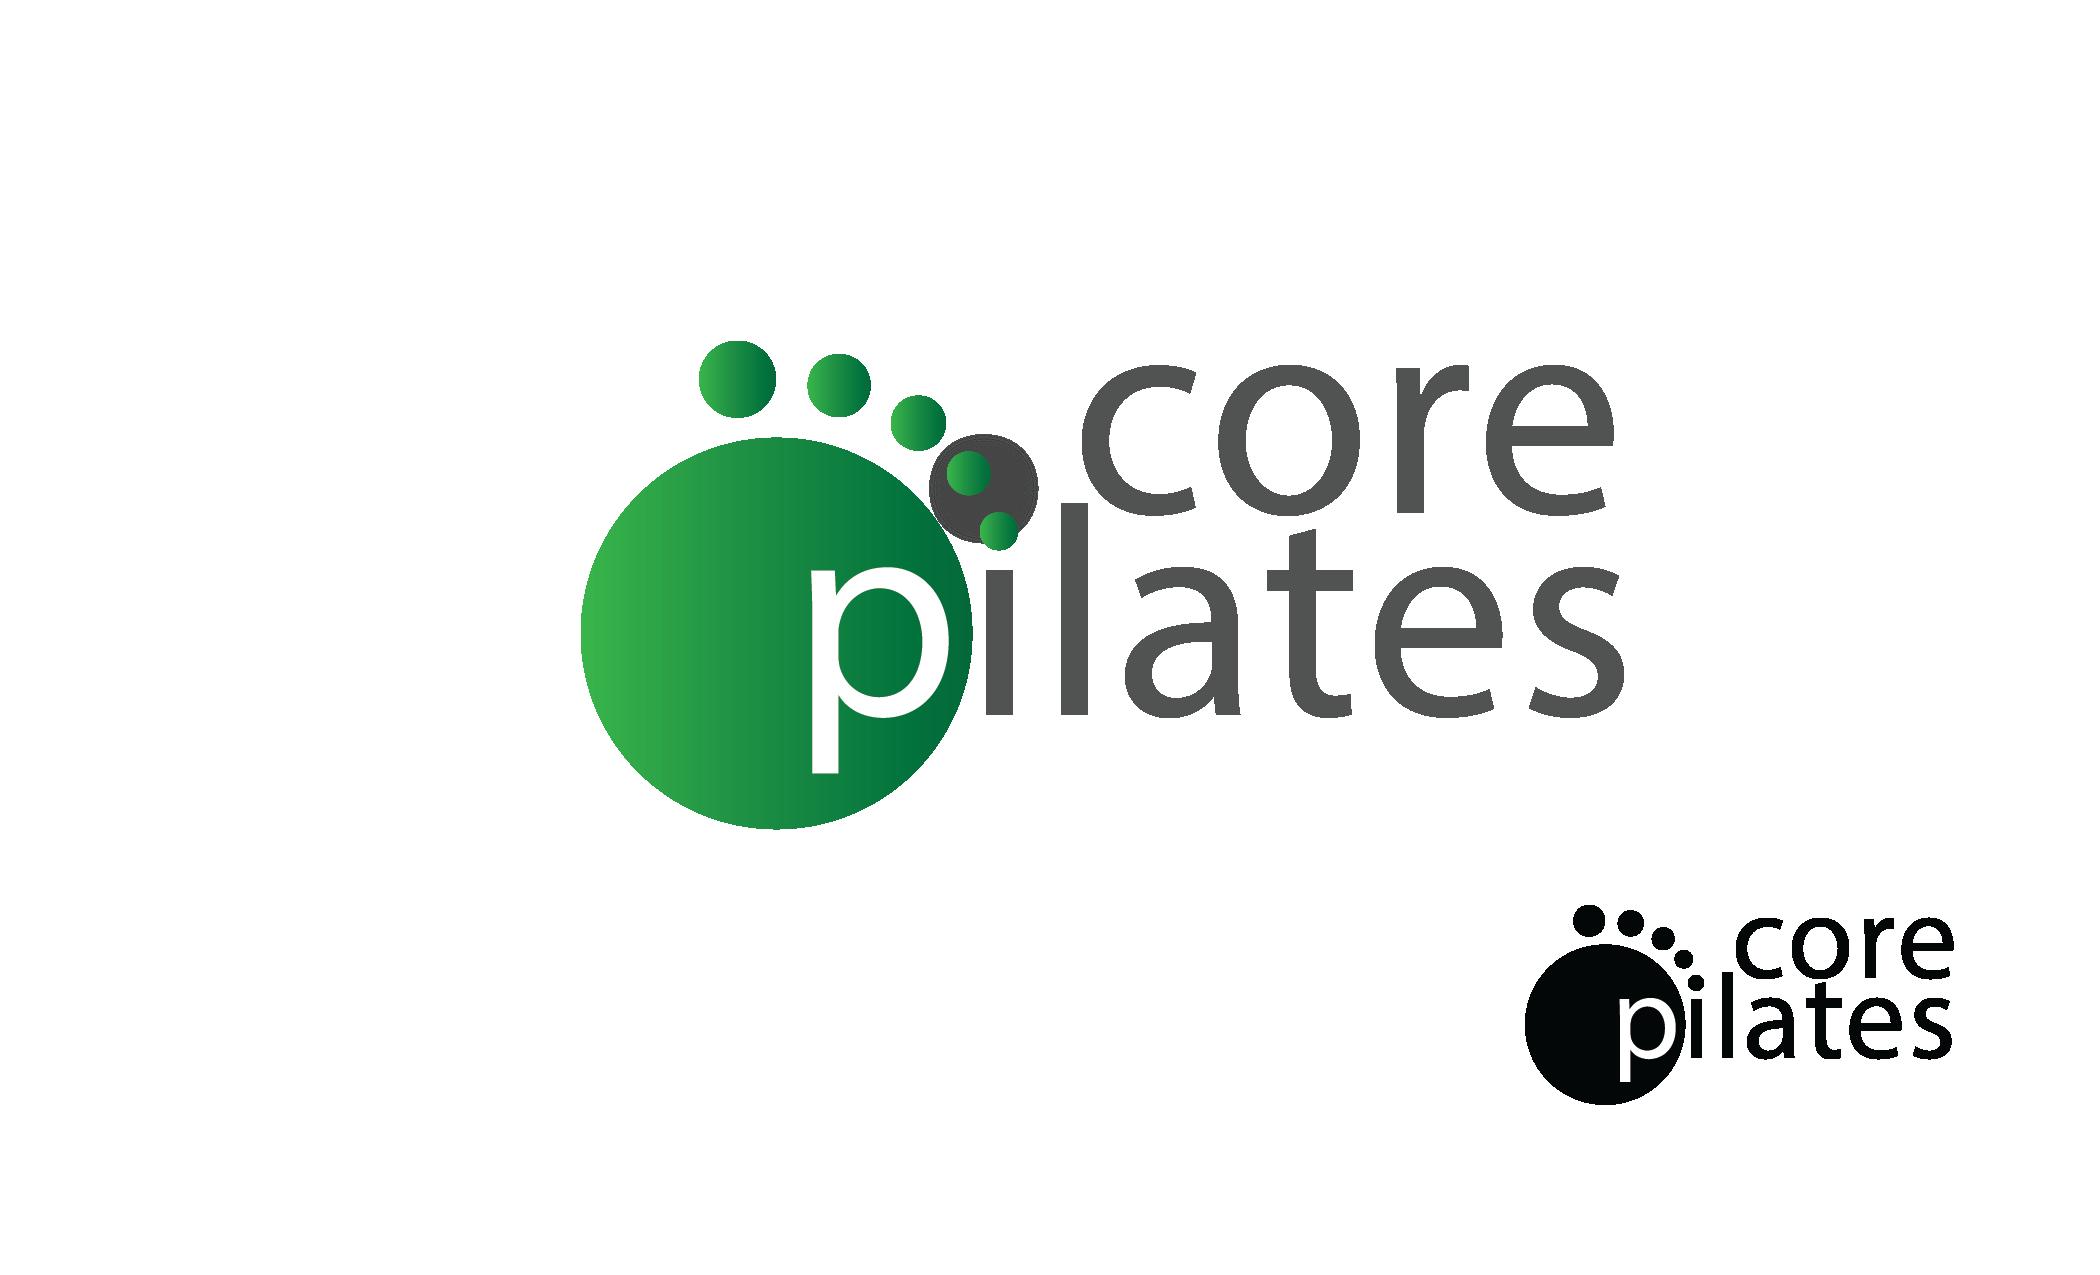 Logo Design by Private User - Entry No. 36 in the Logo Design Contest Core Pilates Logo Design.